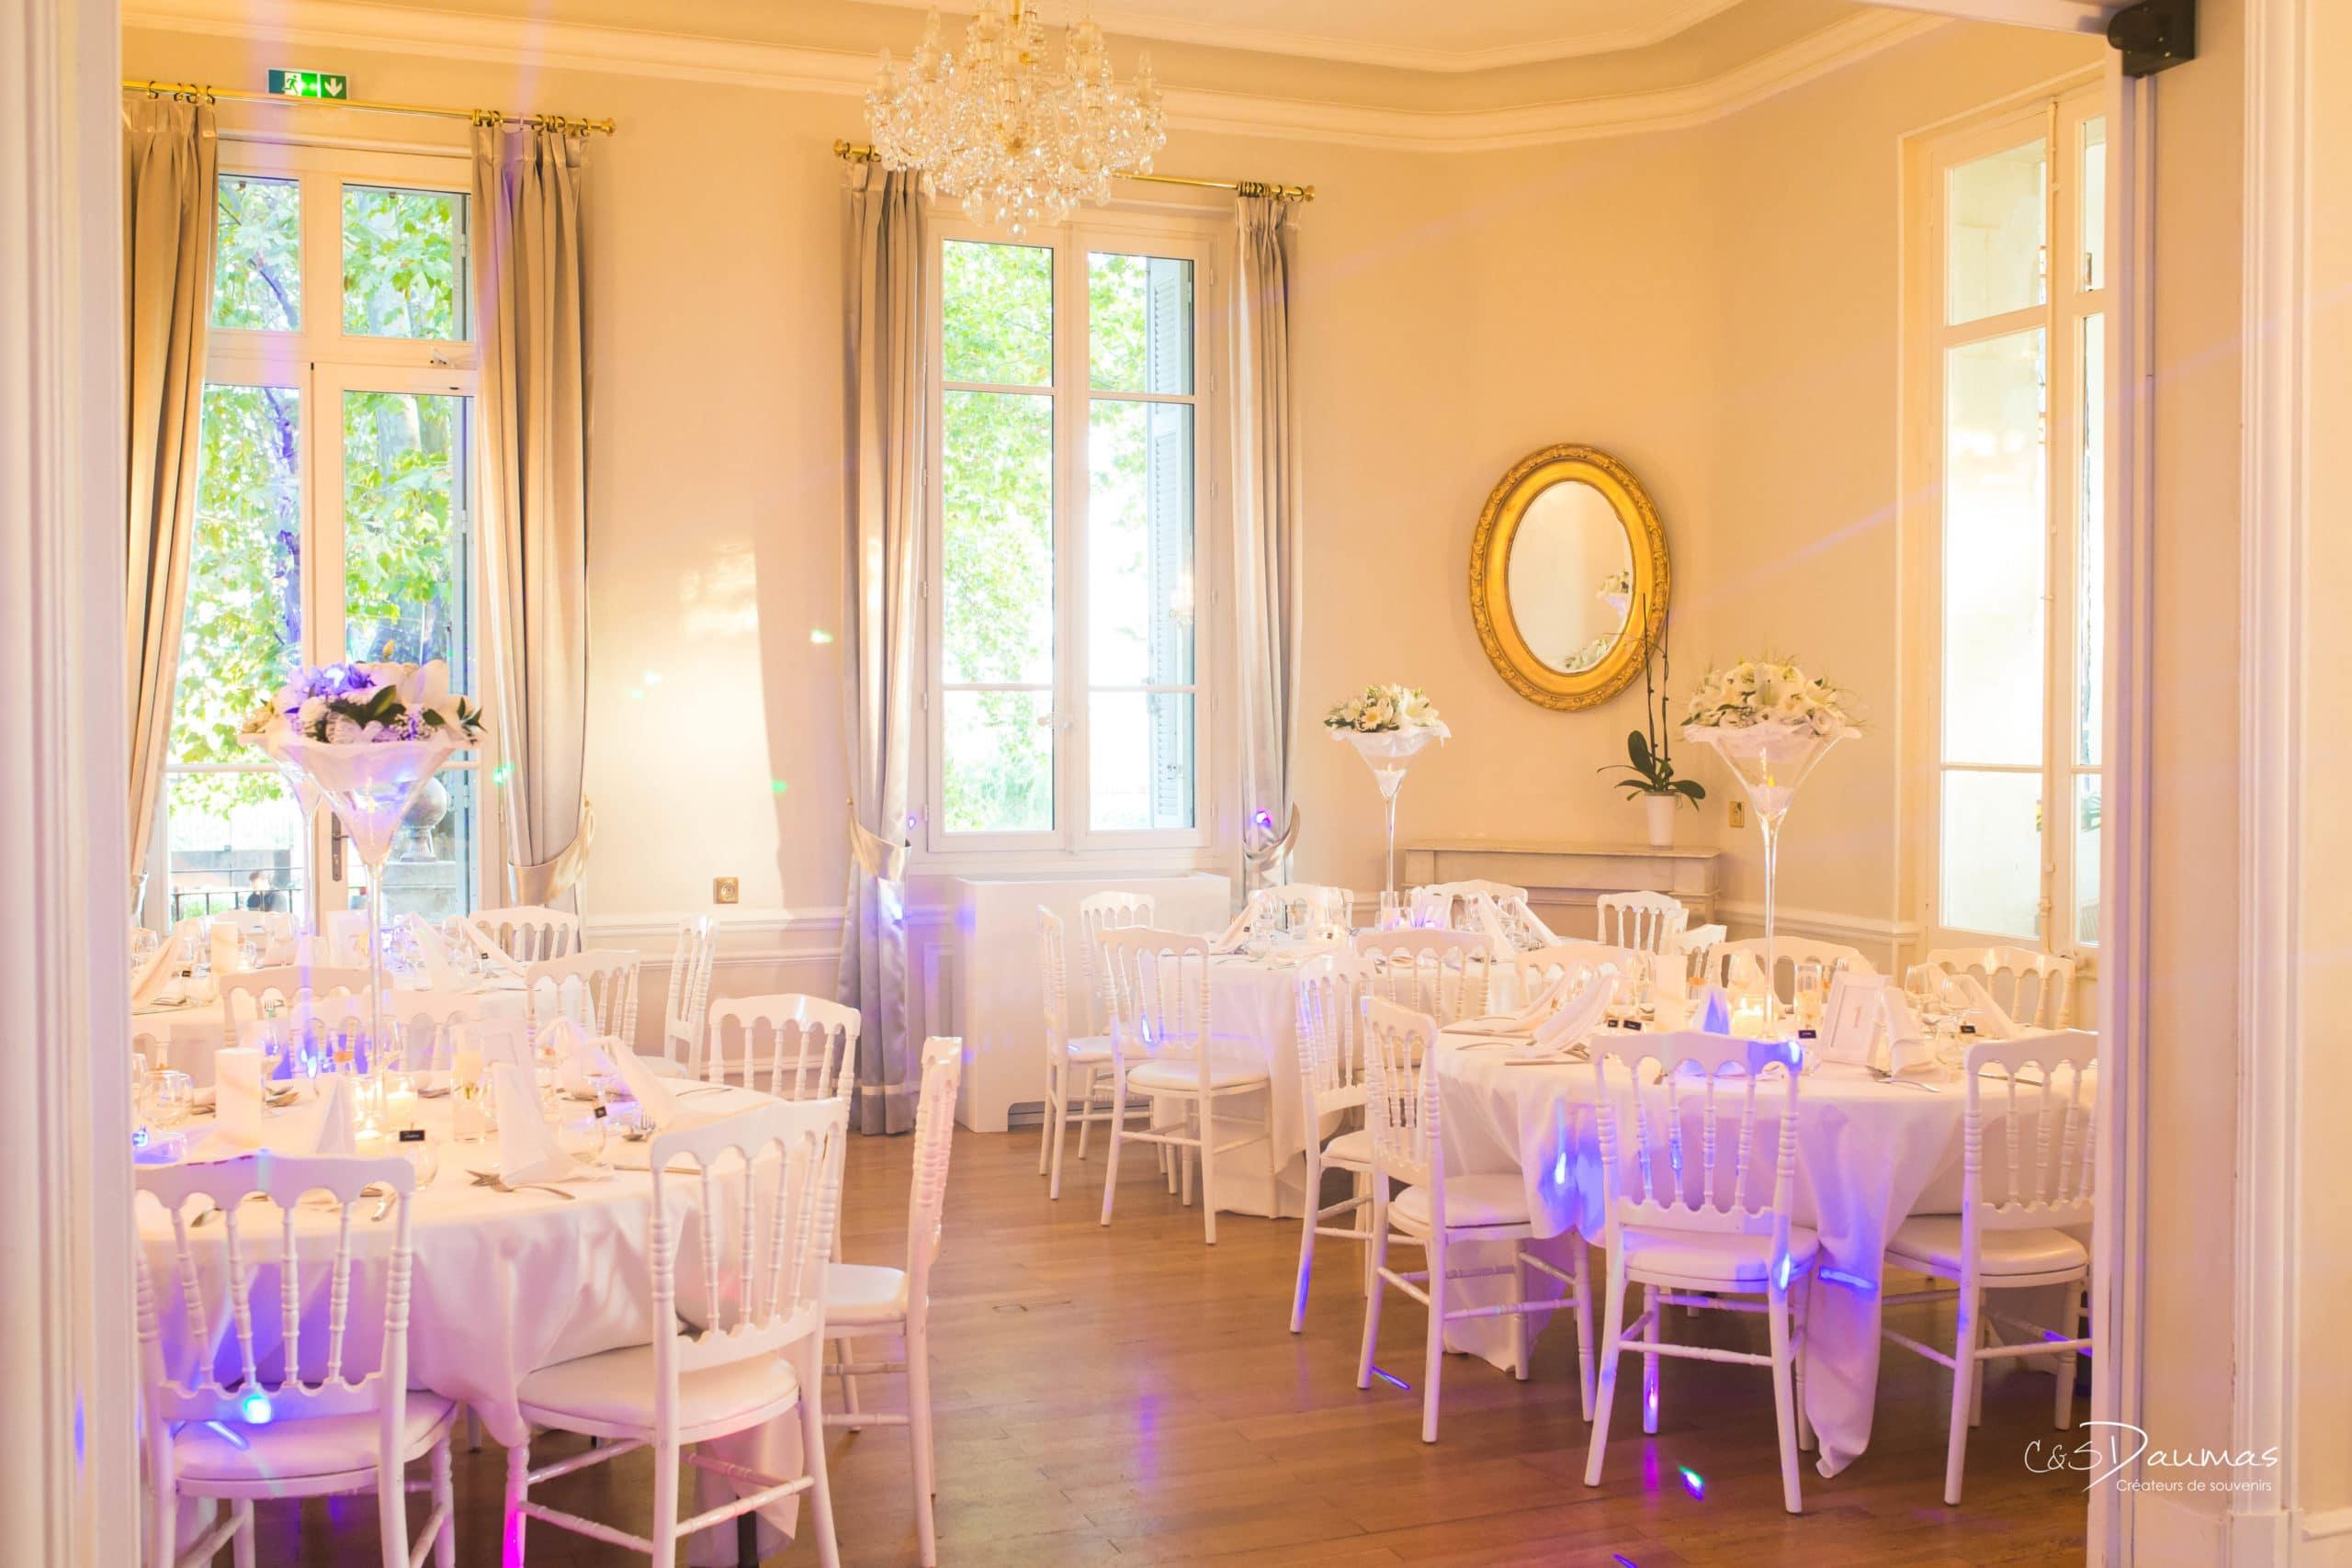 mariage-provence-wedding-venue-reception-chateau-tables-parquet-miroir-13-south-france-bouches-rhone